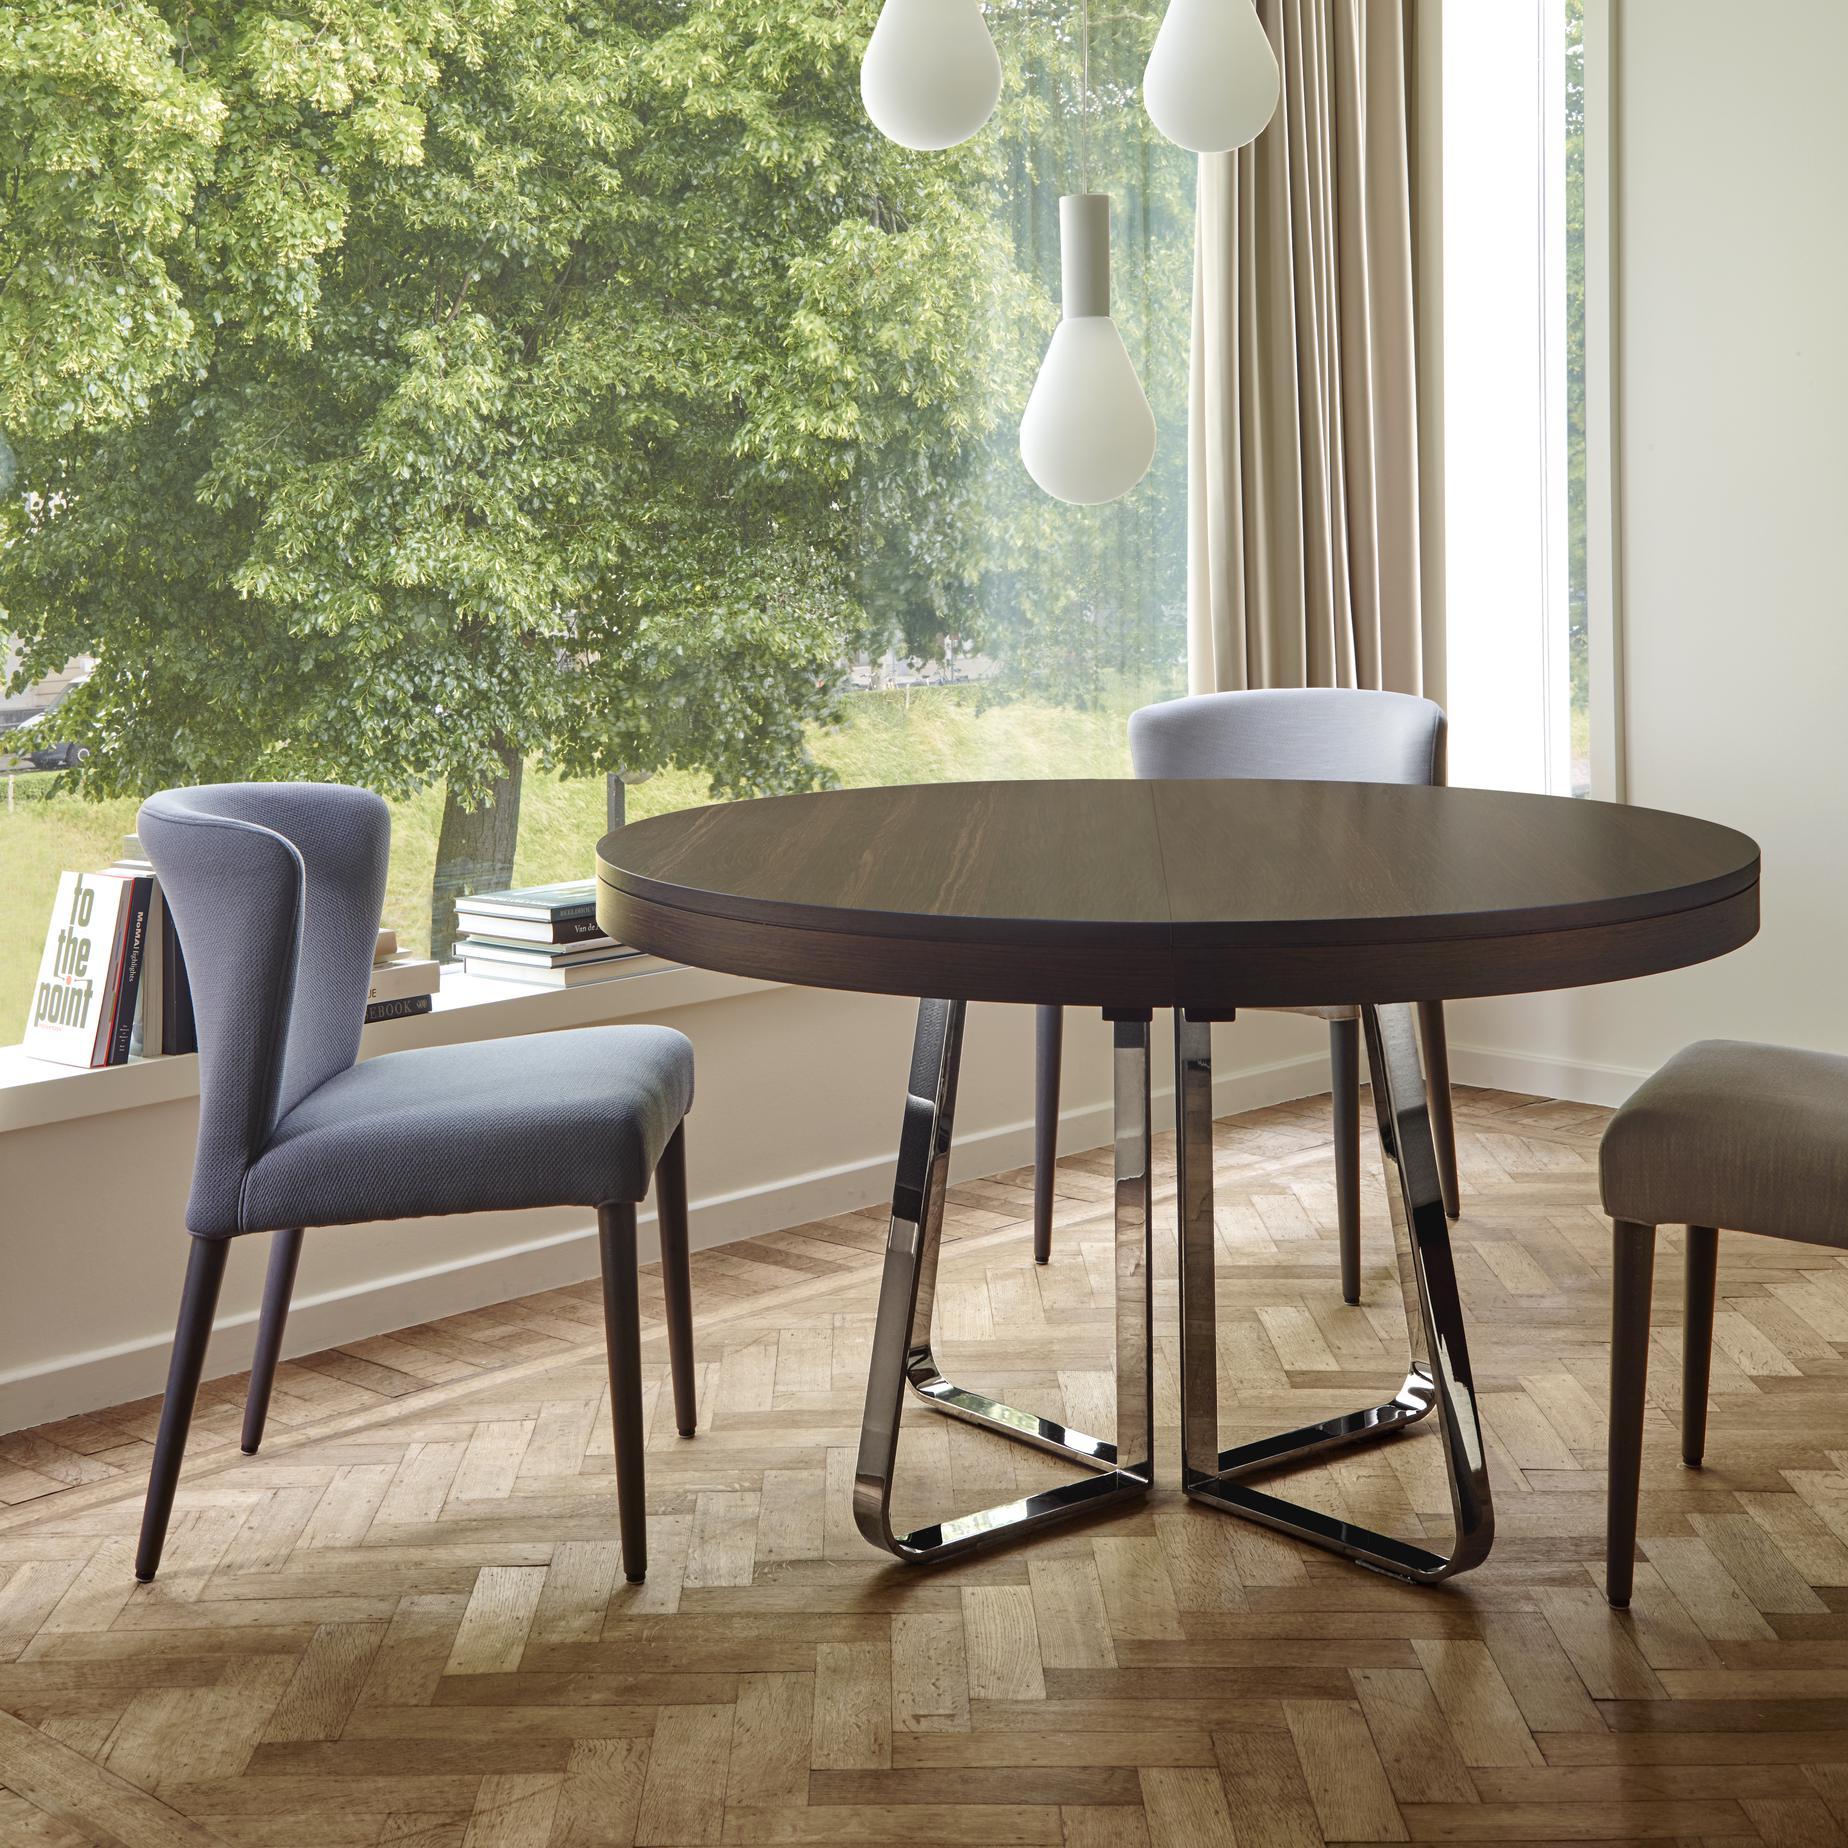 Circo Circa Chairs From Designer Ligne Roset